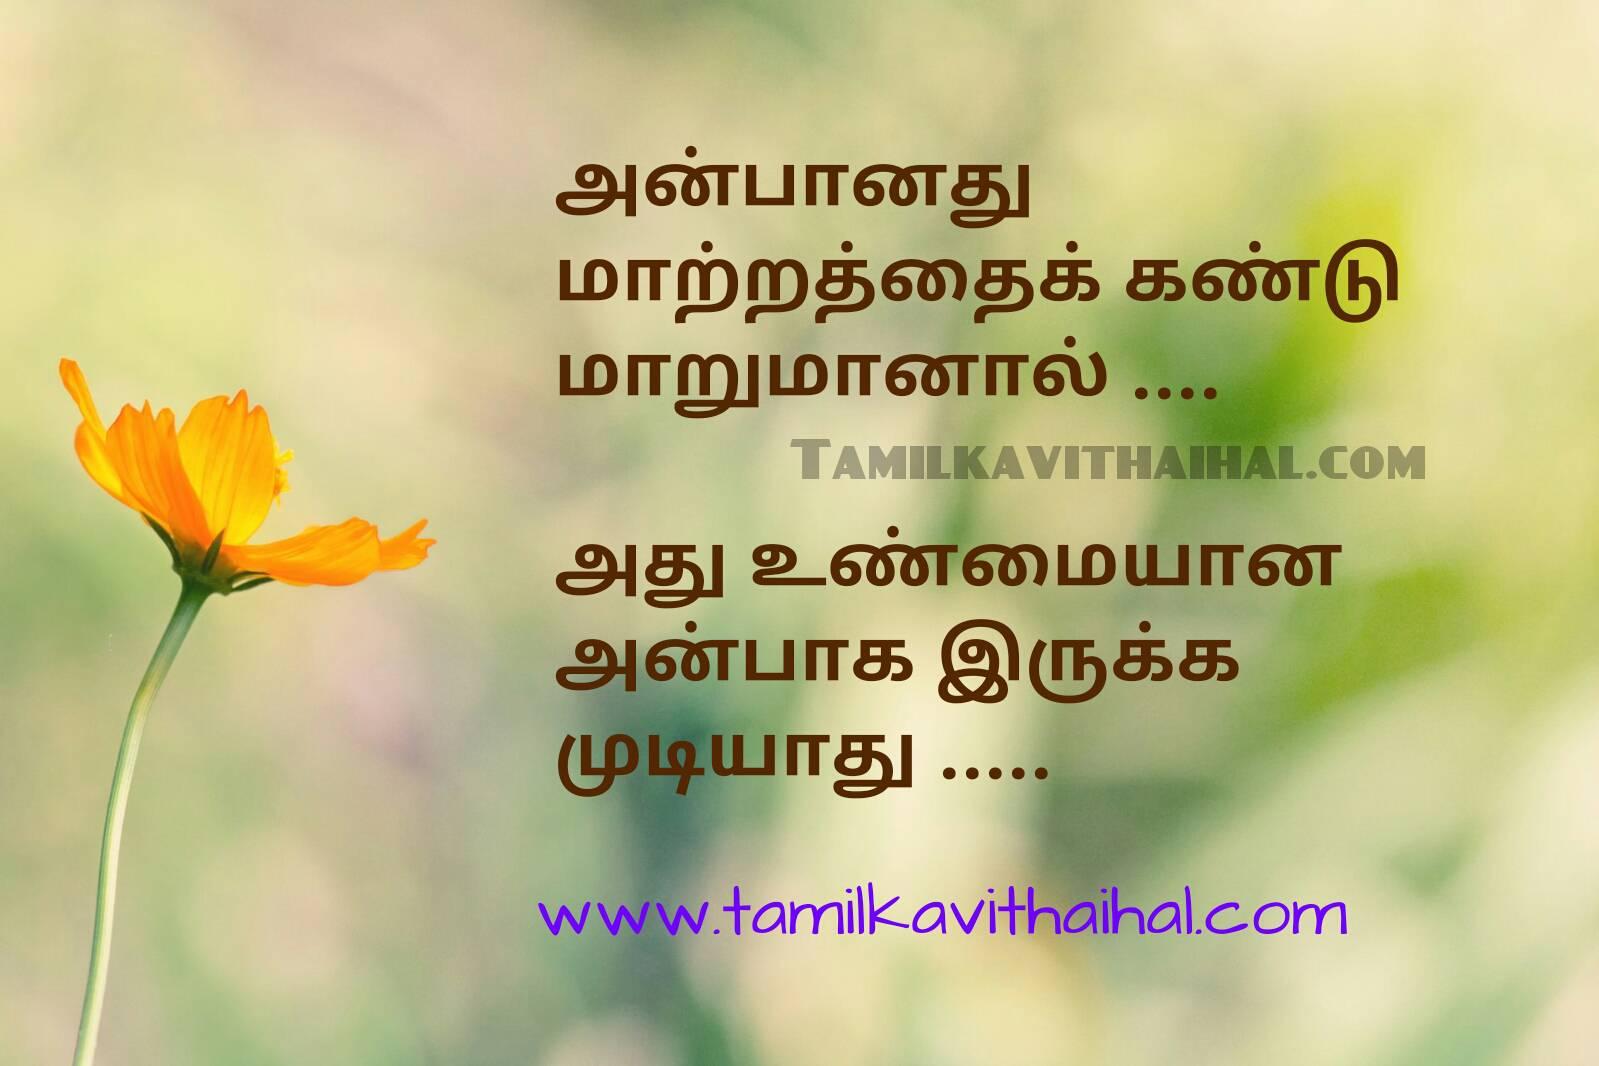 Best anbu feel tamil poem pasam unmaiyana love maatram erukadhu whatsapp dp thathuvam download